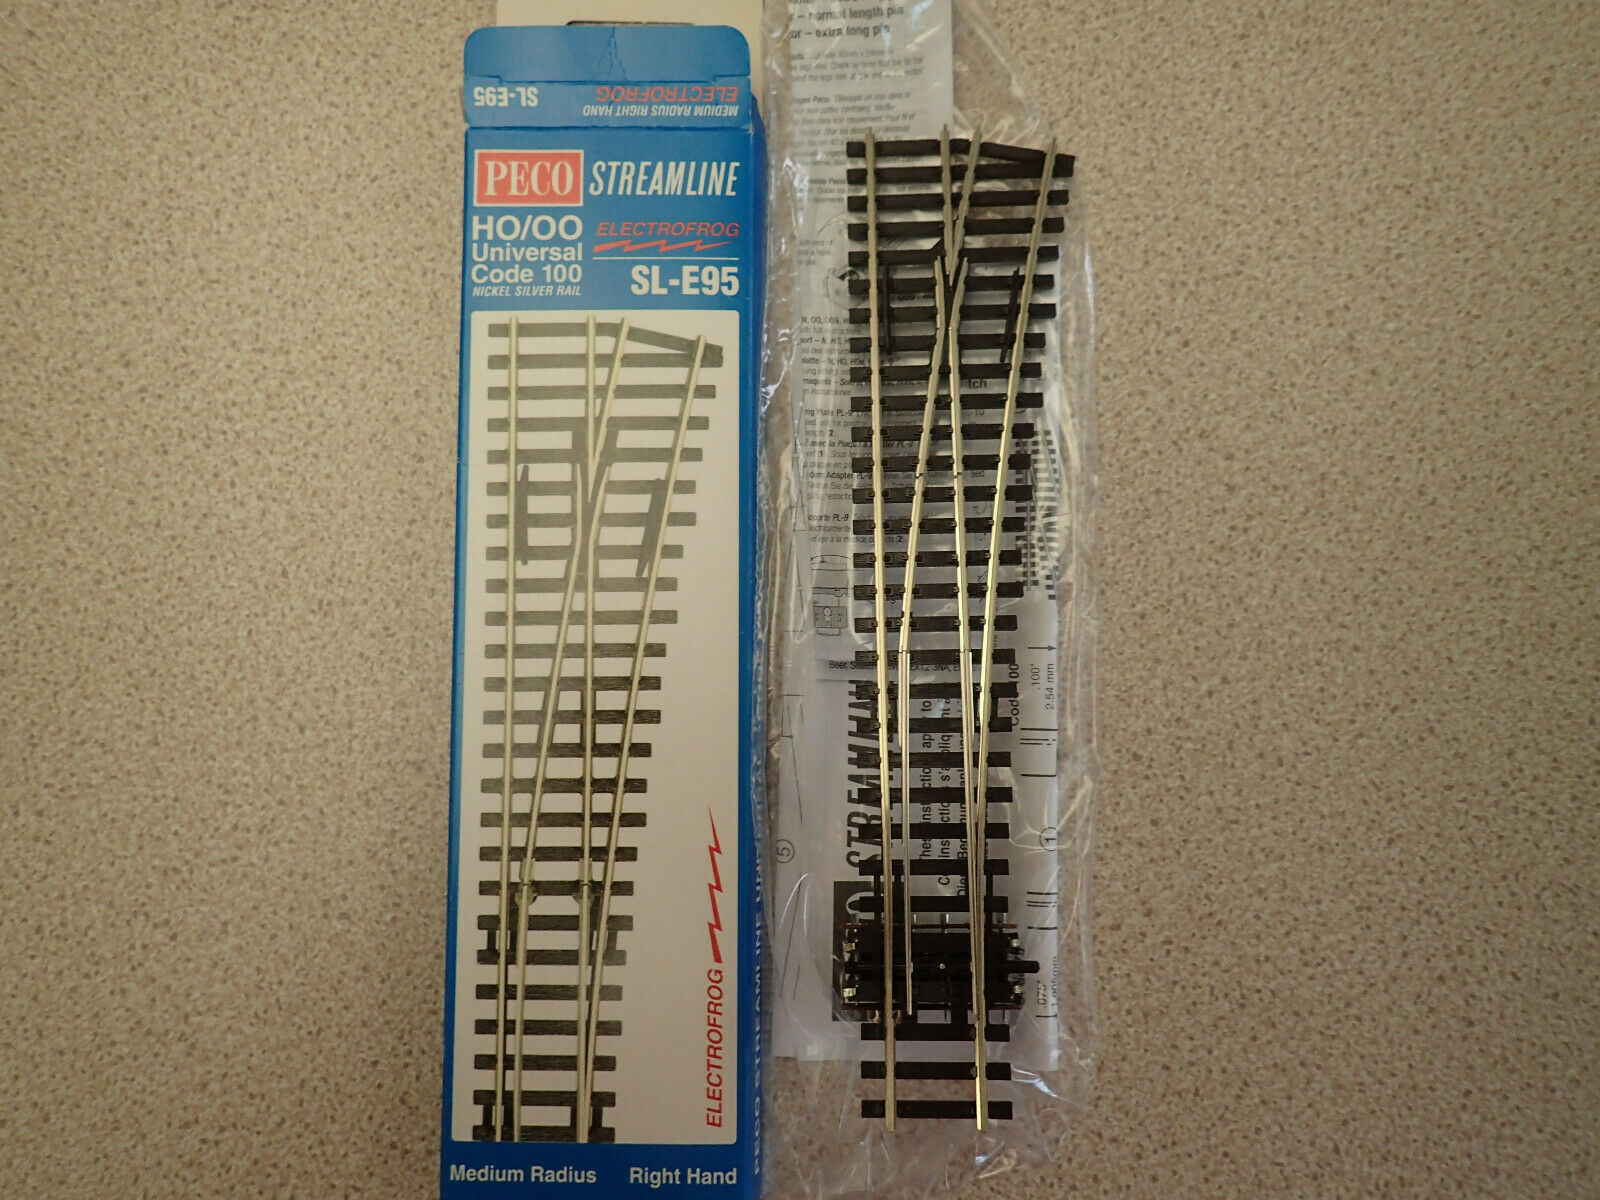 PECO SL-E95 Medium Radius 1st Post 915mm R//H Electrofrog Code 100 Point /'00/'